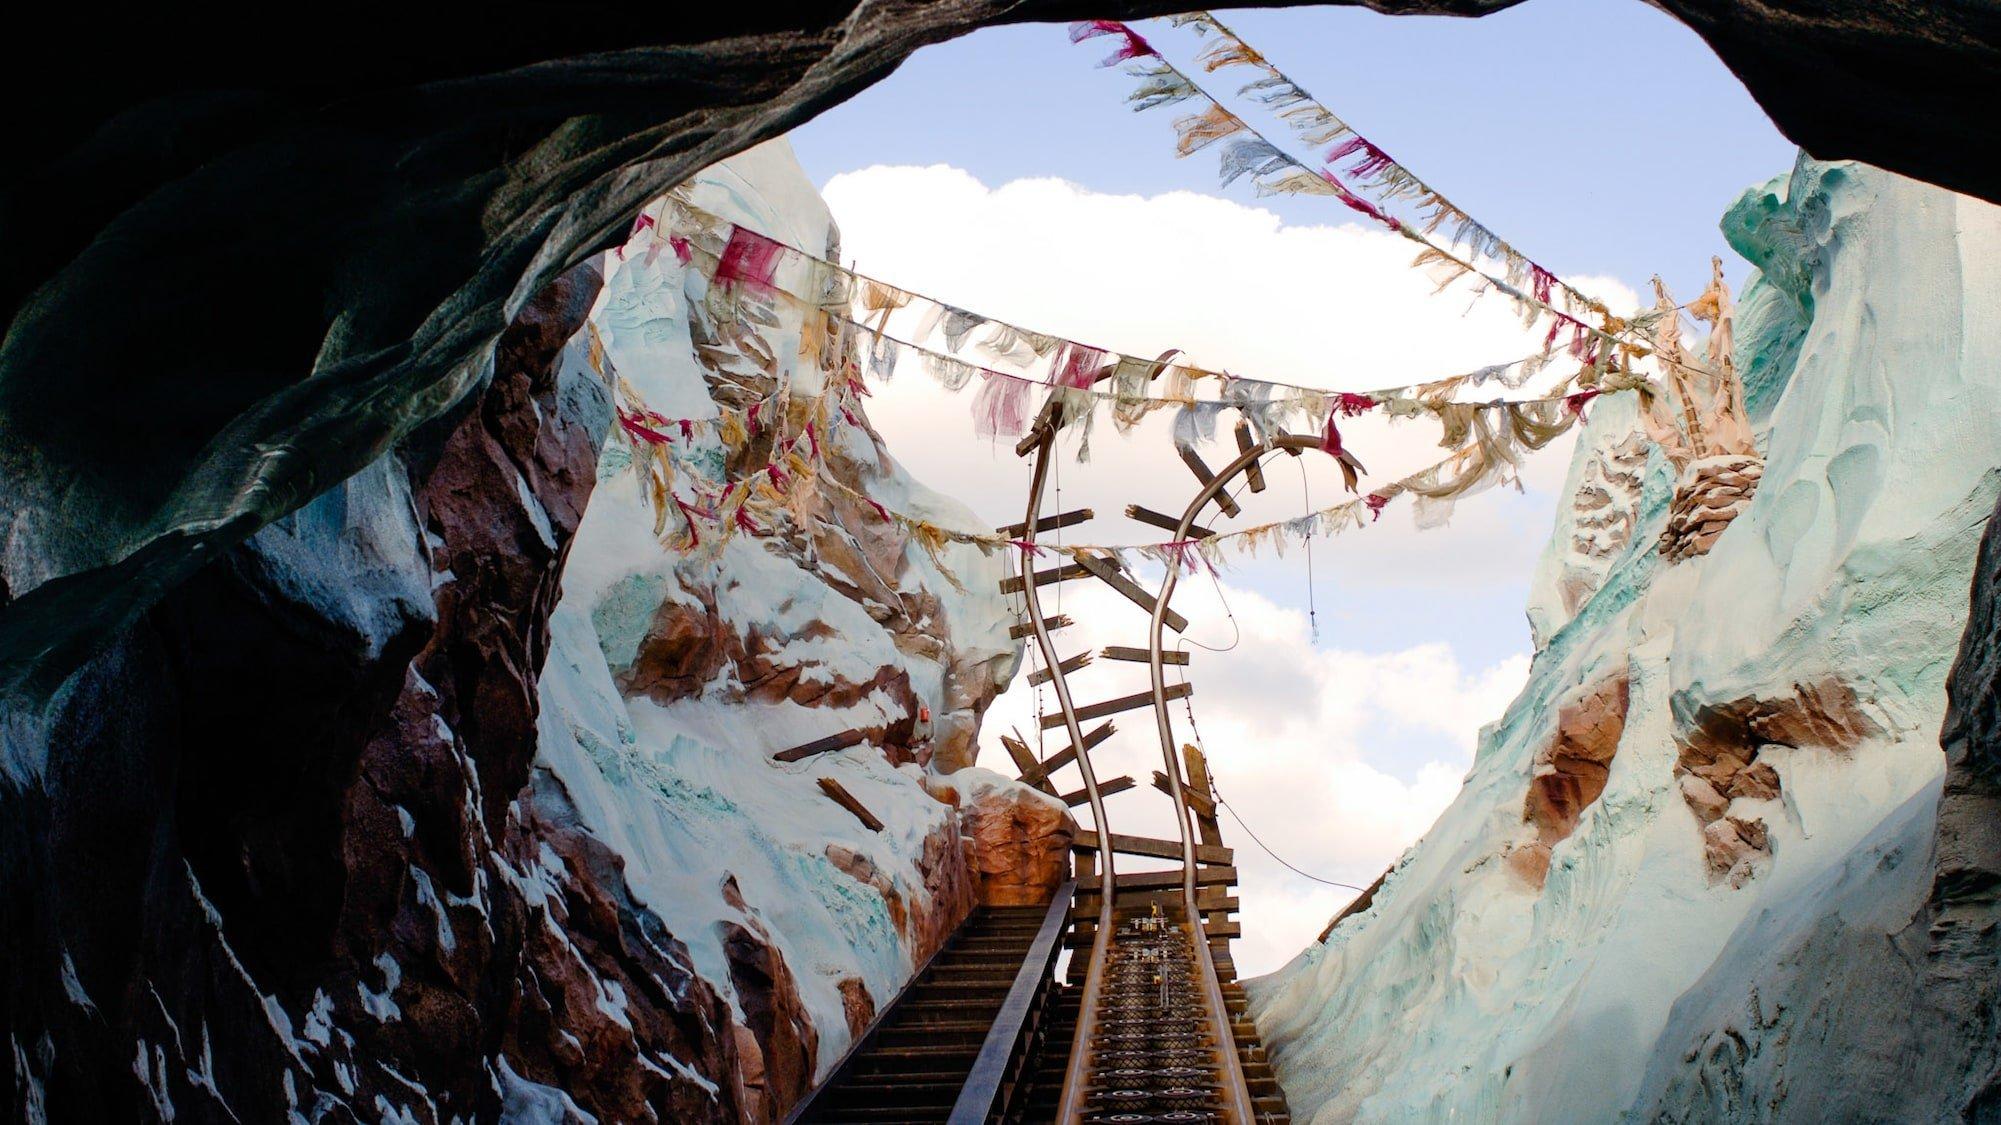 Expedition Everest | Animal Kingdom Attractions | Walt Disney ...